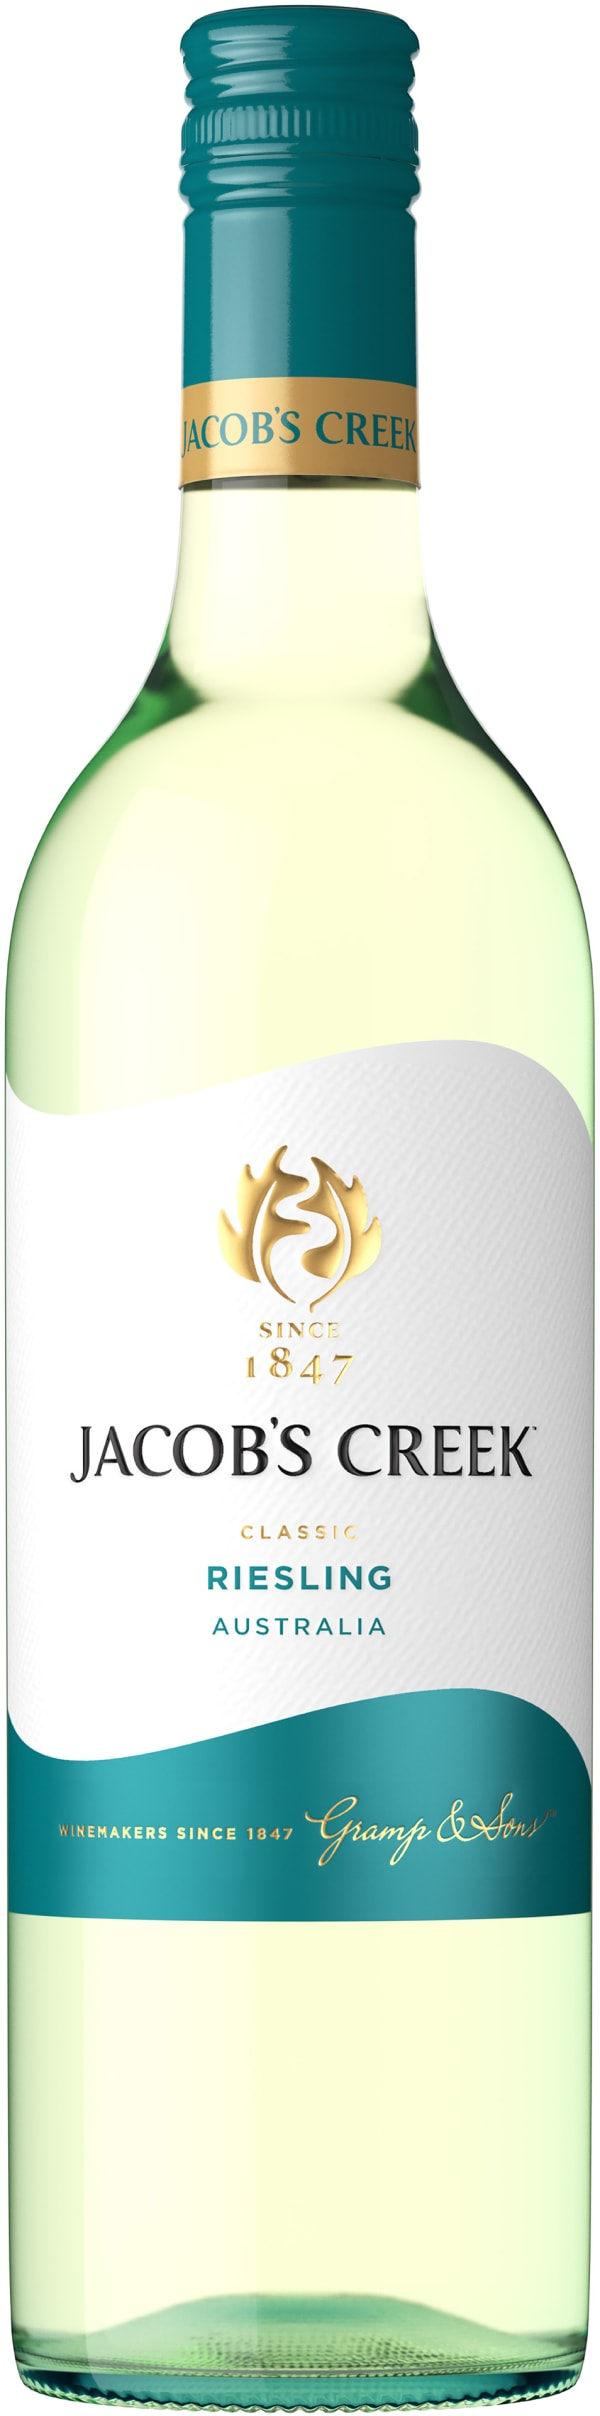 Jacob's Creek Riesling 2016